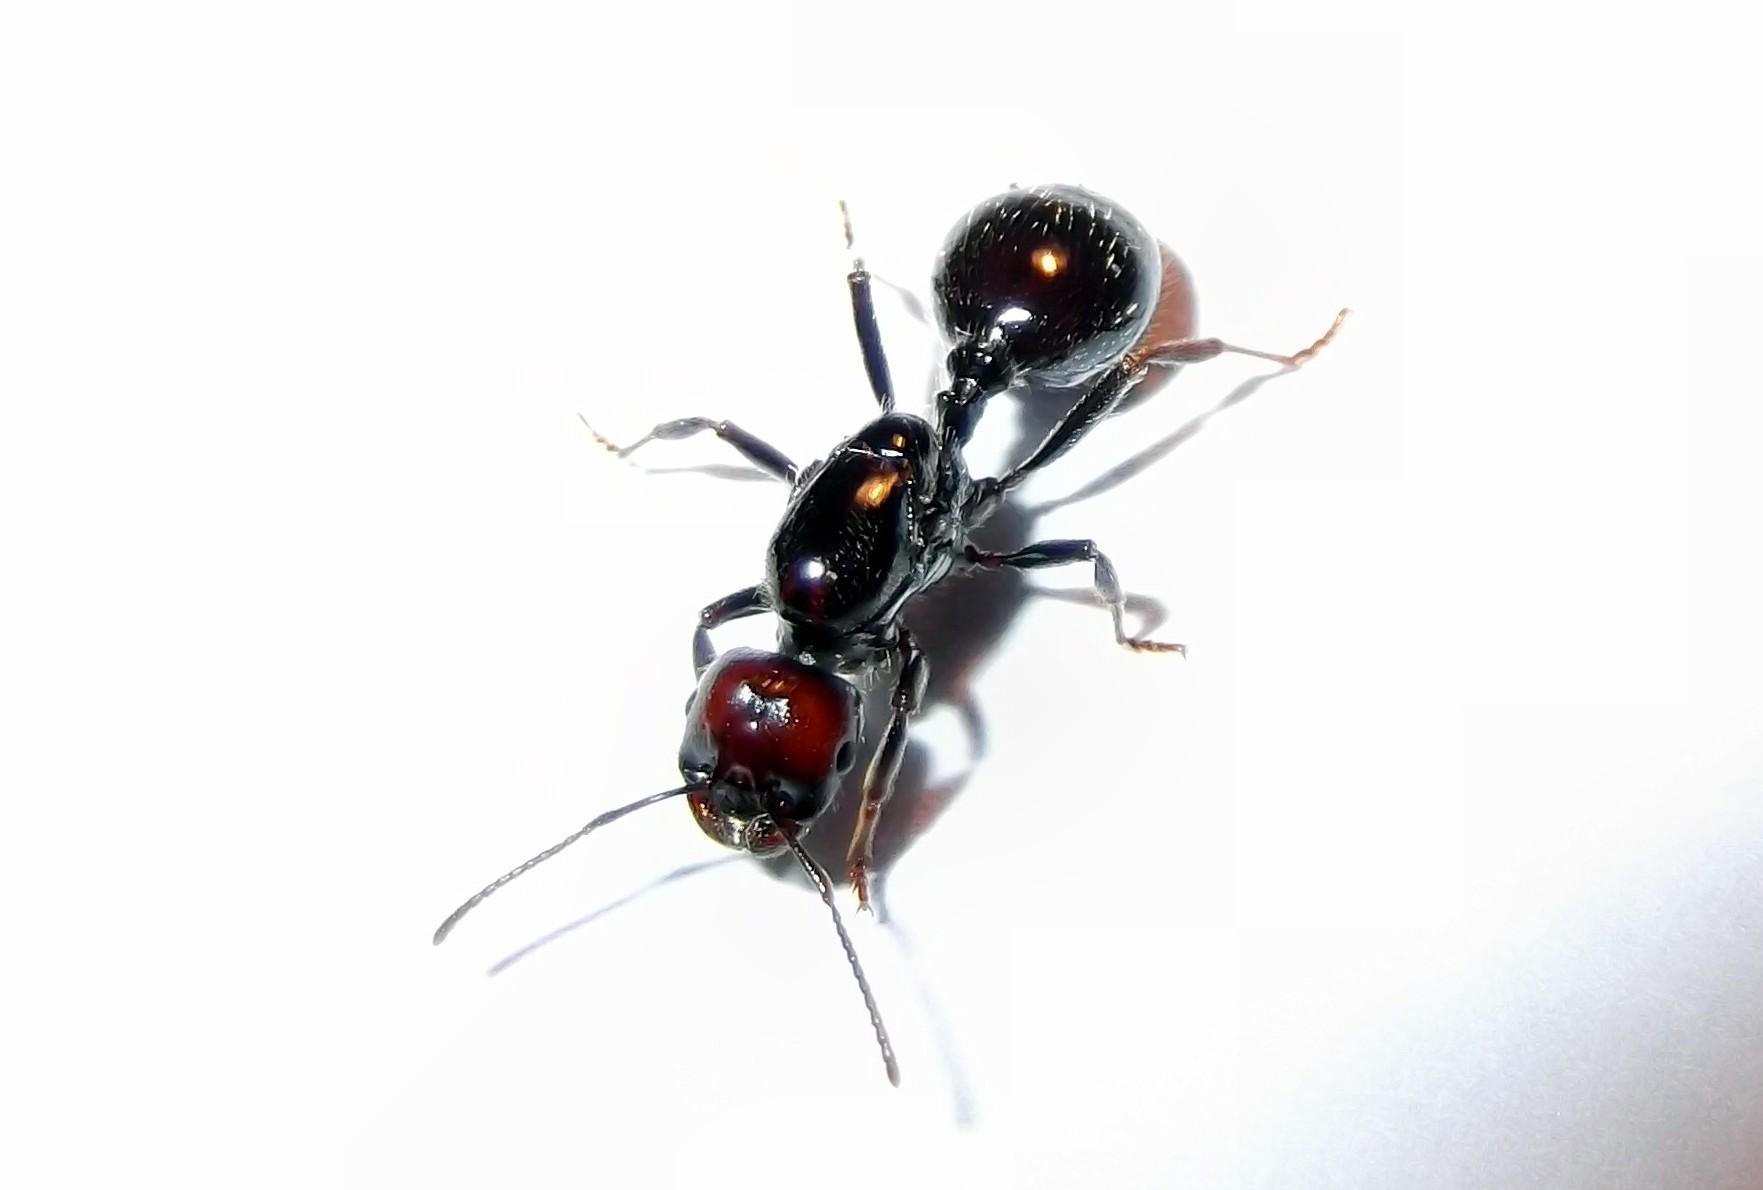 Królowa mrówek Messor barbarus